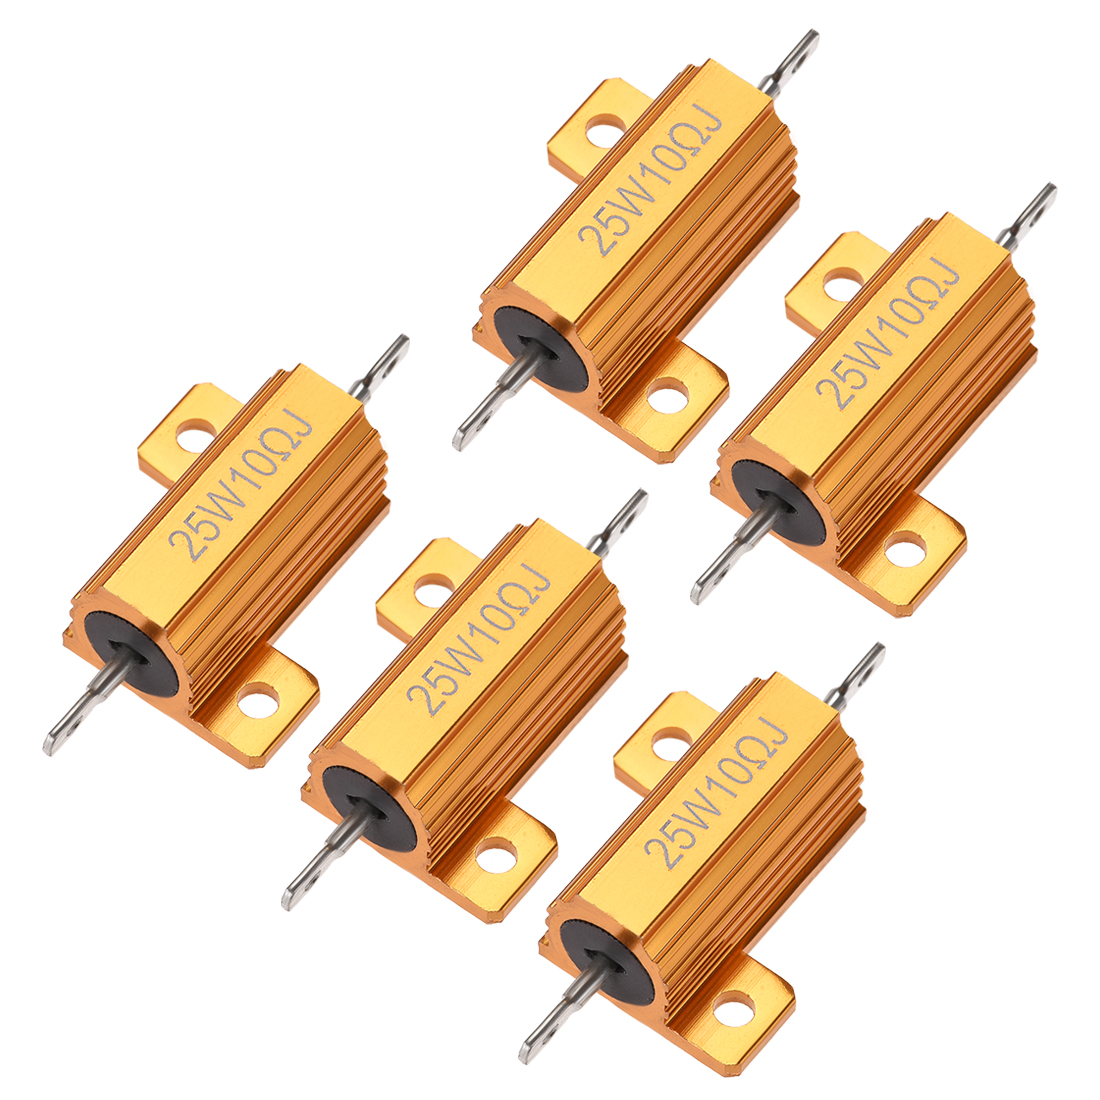 25W 10 Ohm 5% Aluminum Housing Resistor Wirewound Resistor Gold Tone 5 Pcs